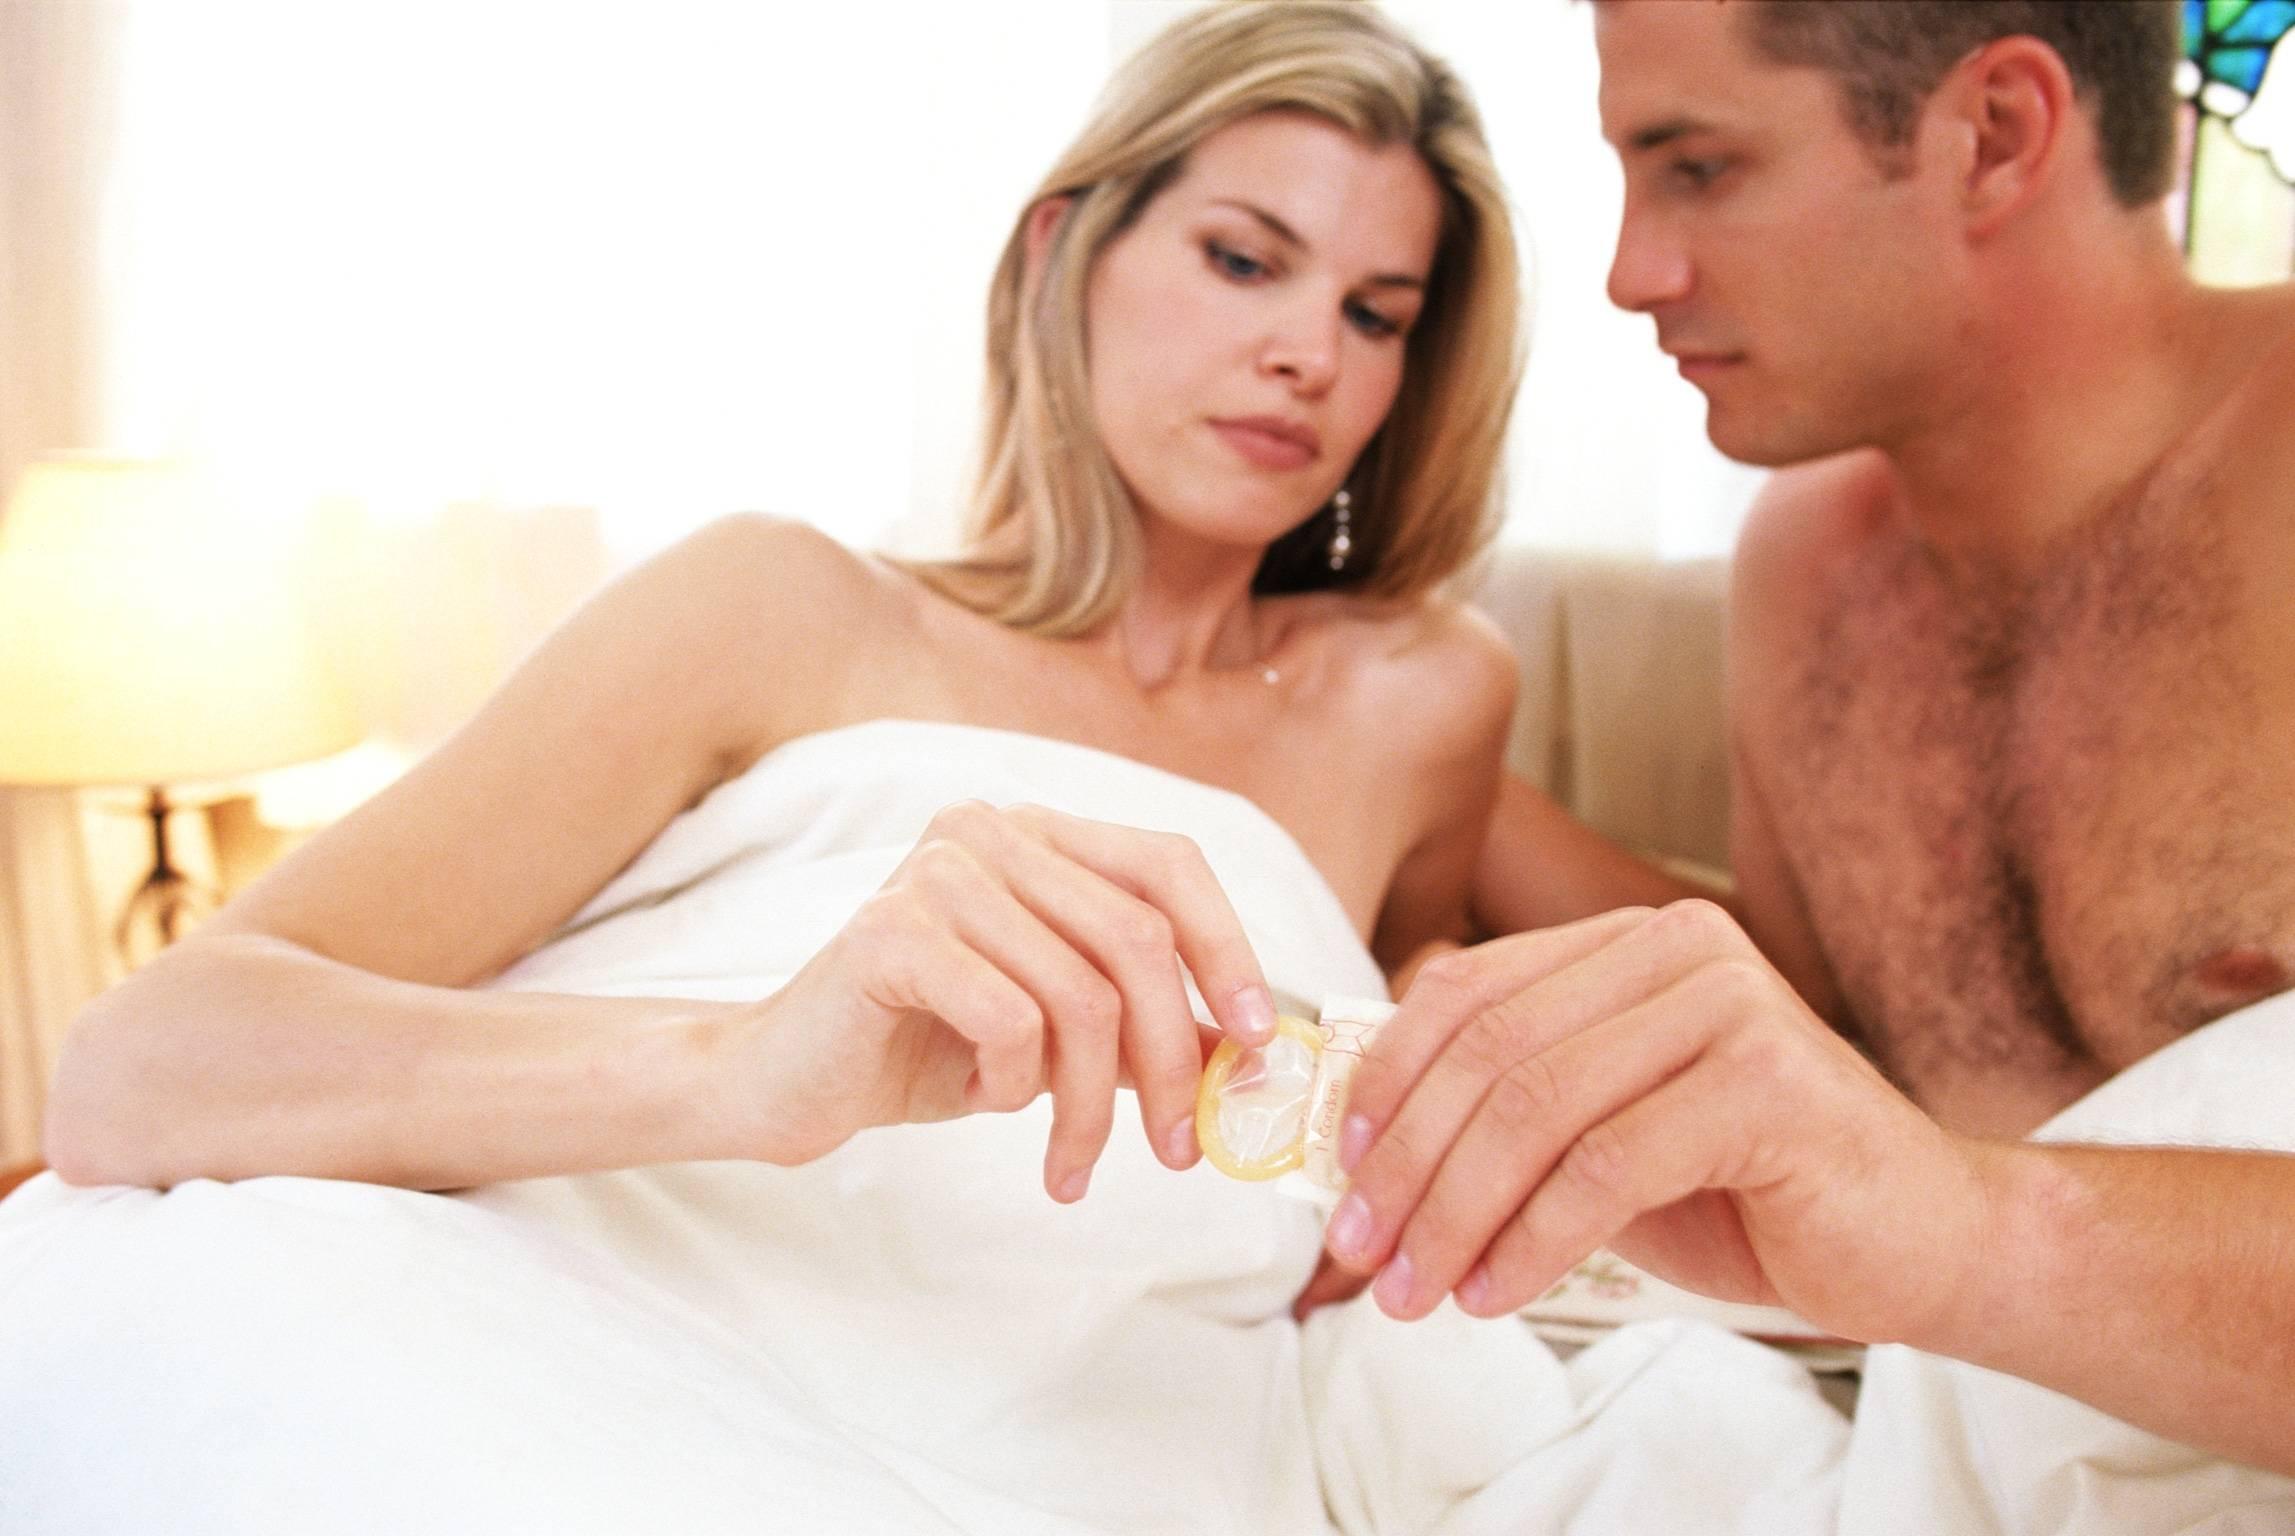 Можно Ли Забеременеть Без Секса